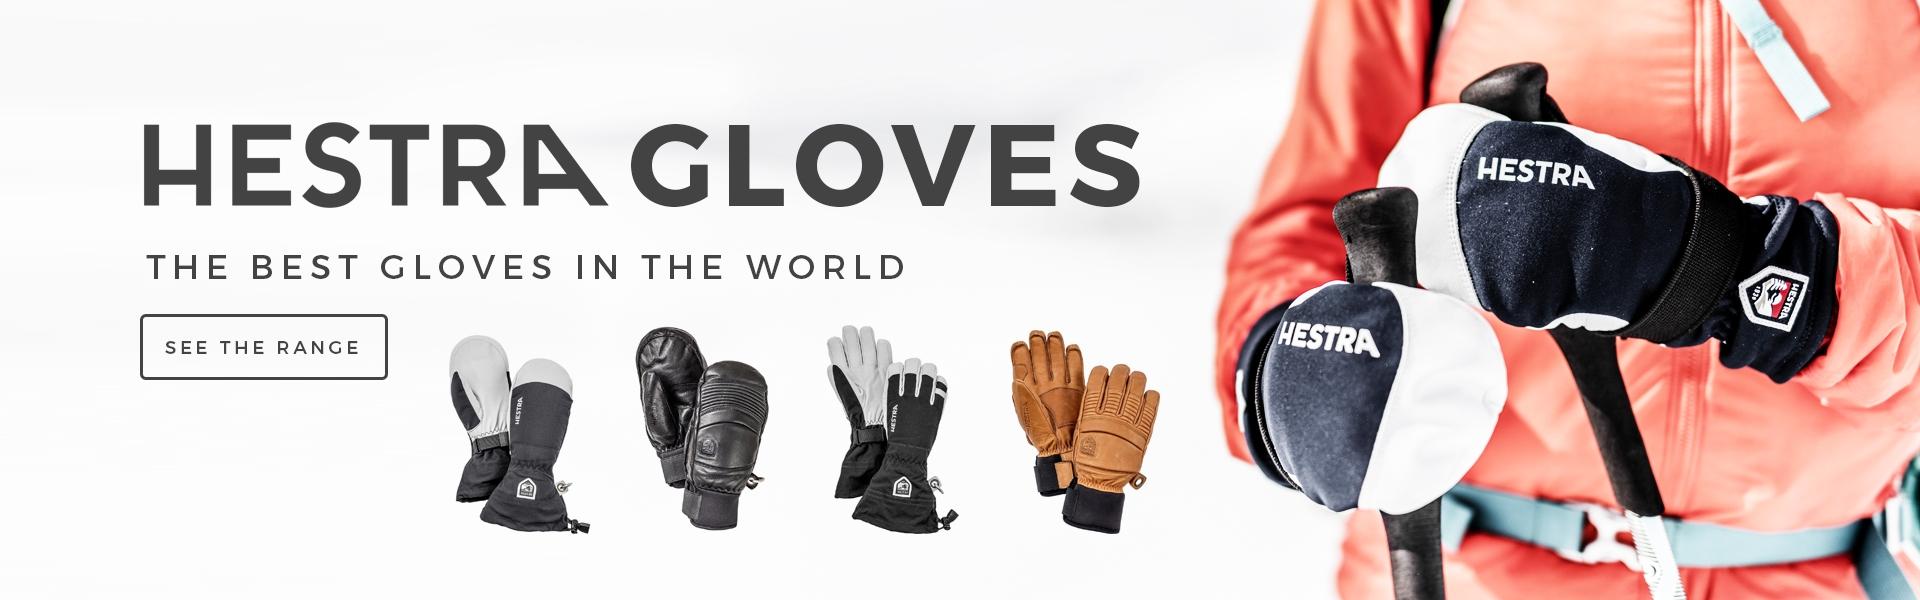 Buy Hestra Gloves Online